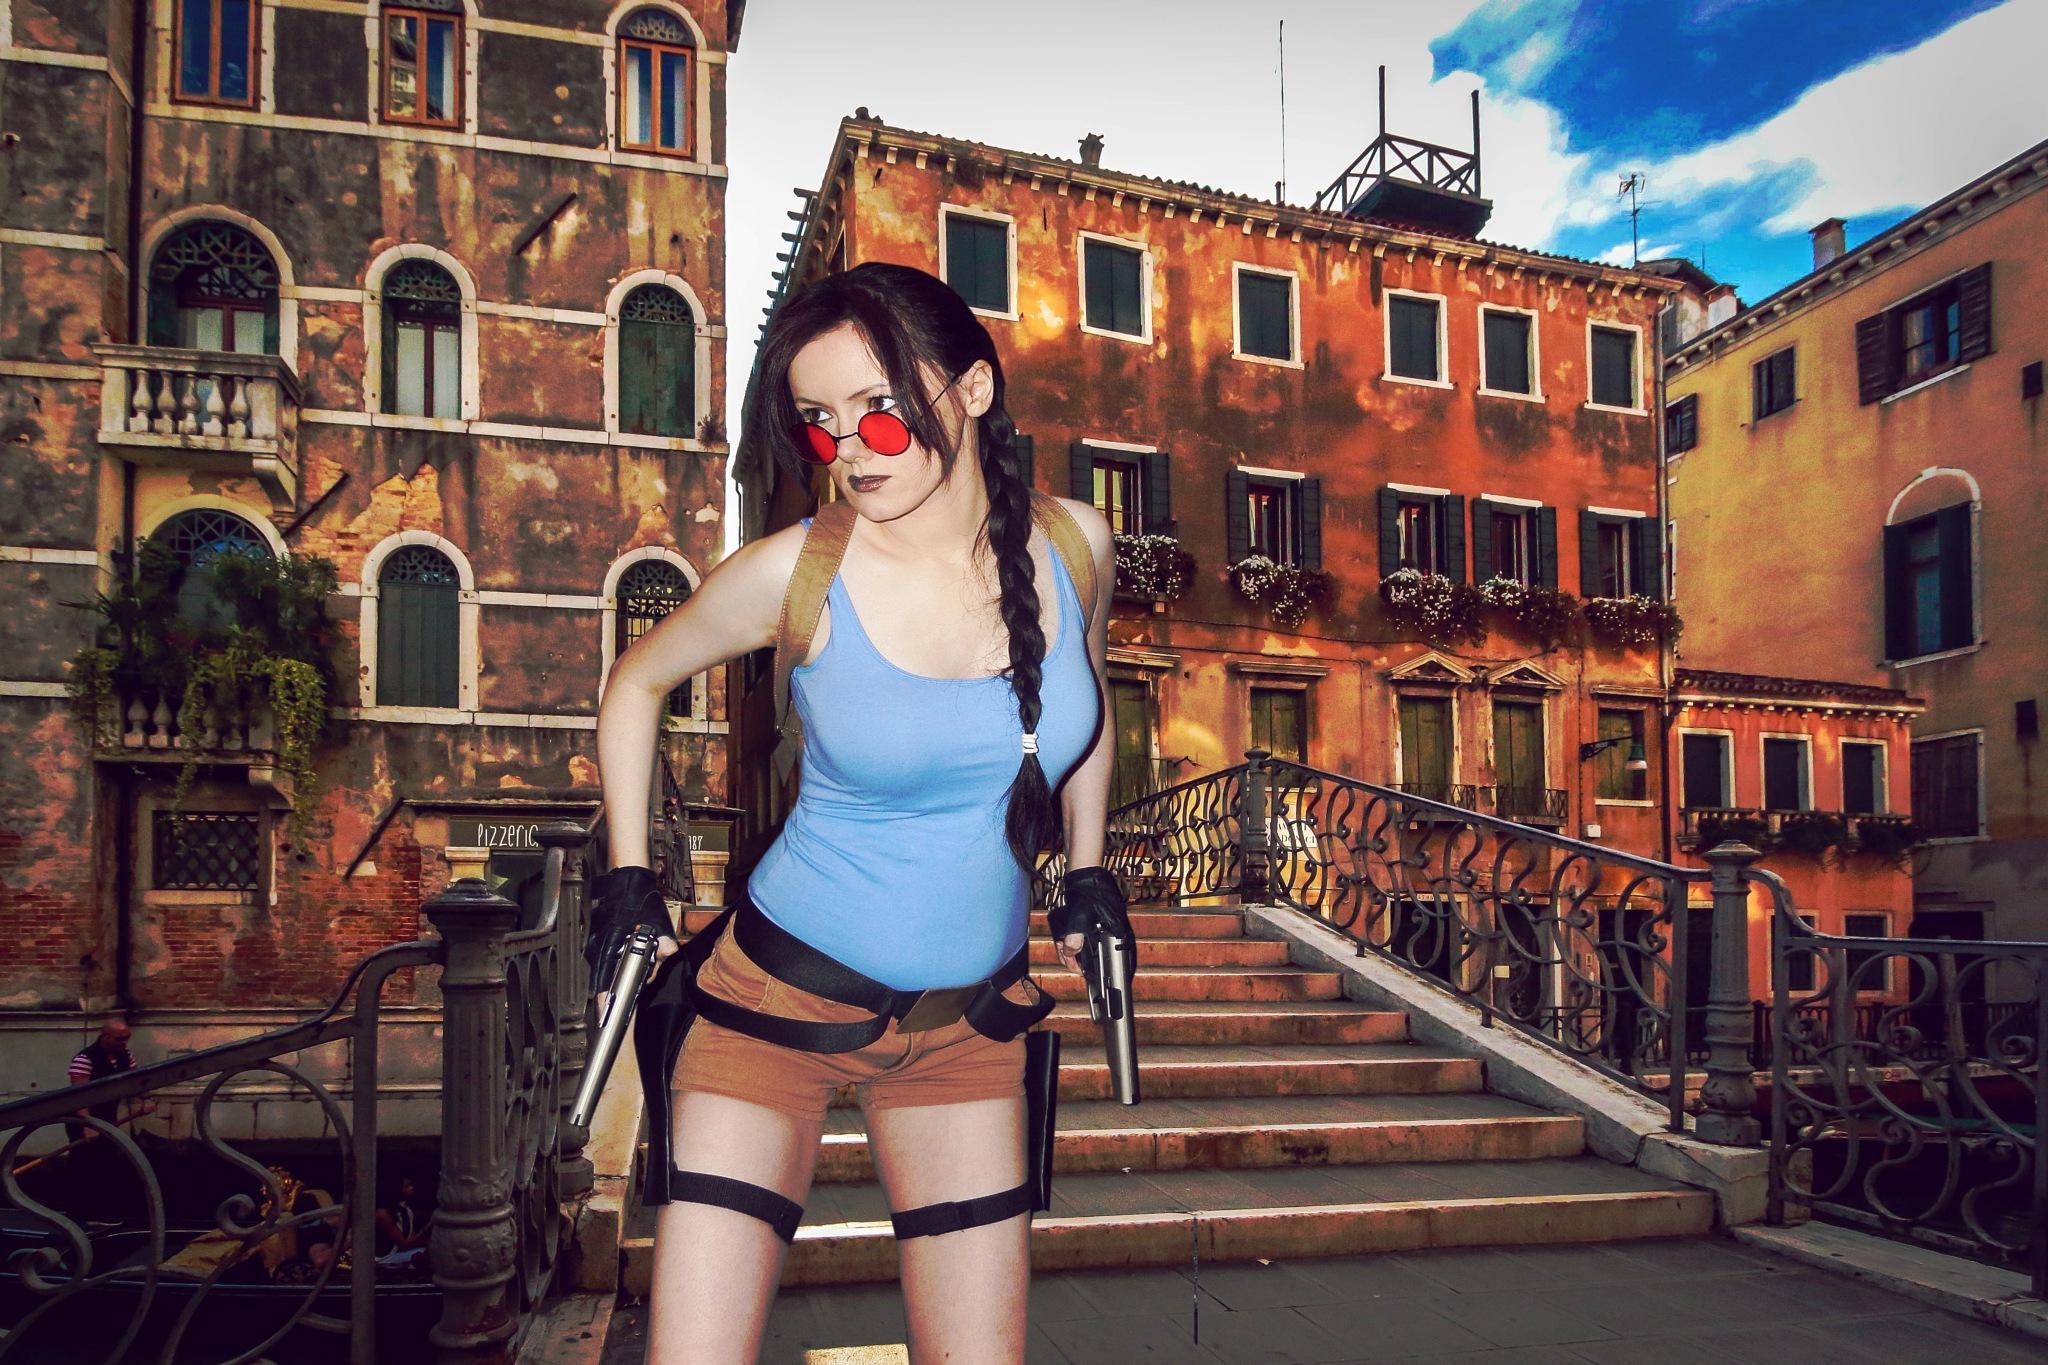 Tomb Raider 2 The Dagger Of Xian-Lara Croft by CandyCosmic